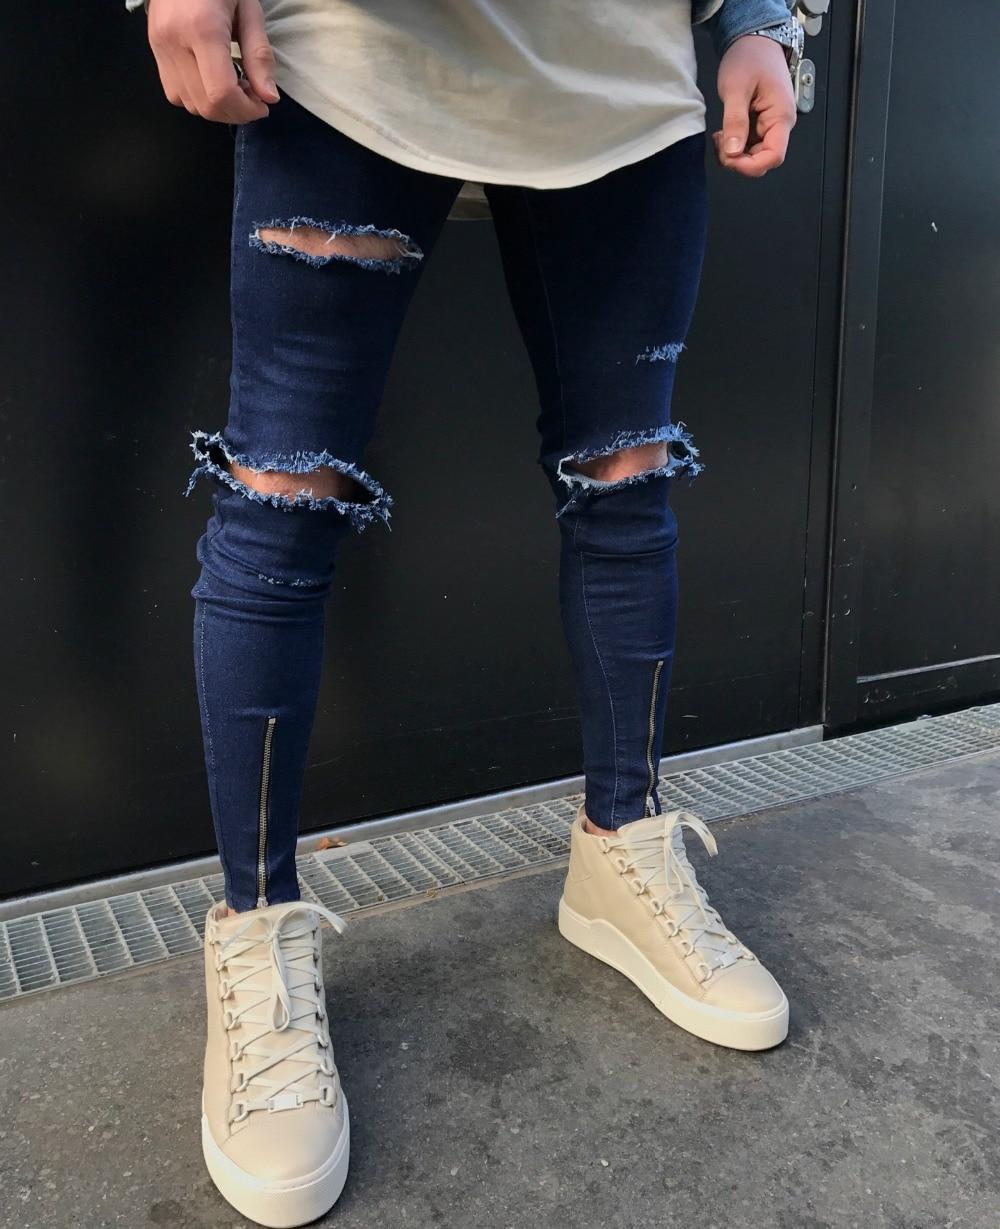 a33f8c177495 2018 Hot Sale Knee hole Ripped Men's Skinny jeans Hip Hop Bottom Zipper  Stretch Denim Punk Rap Pants biker motorcycle men jeans-in Jeans from Men's  Clothing ...